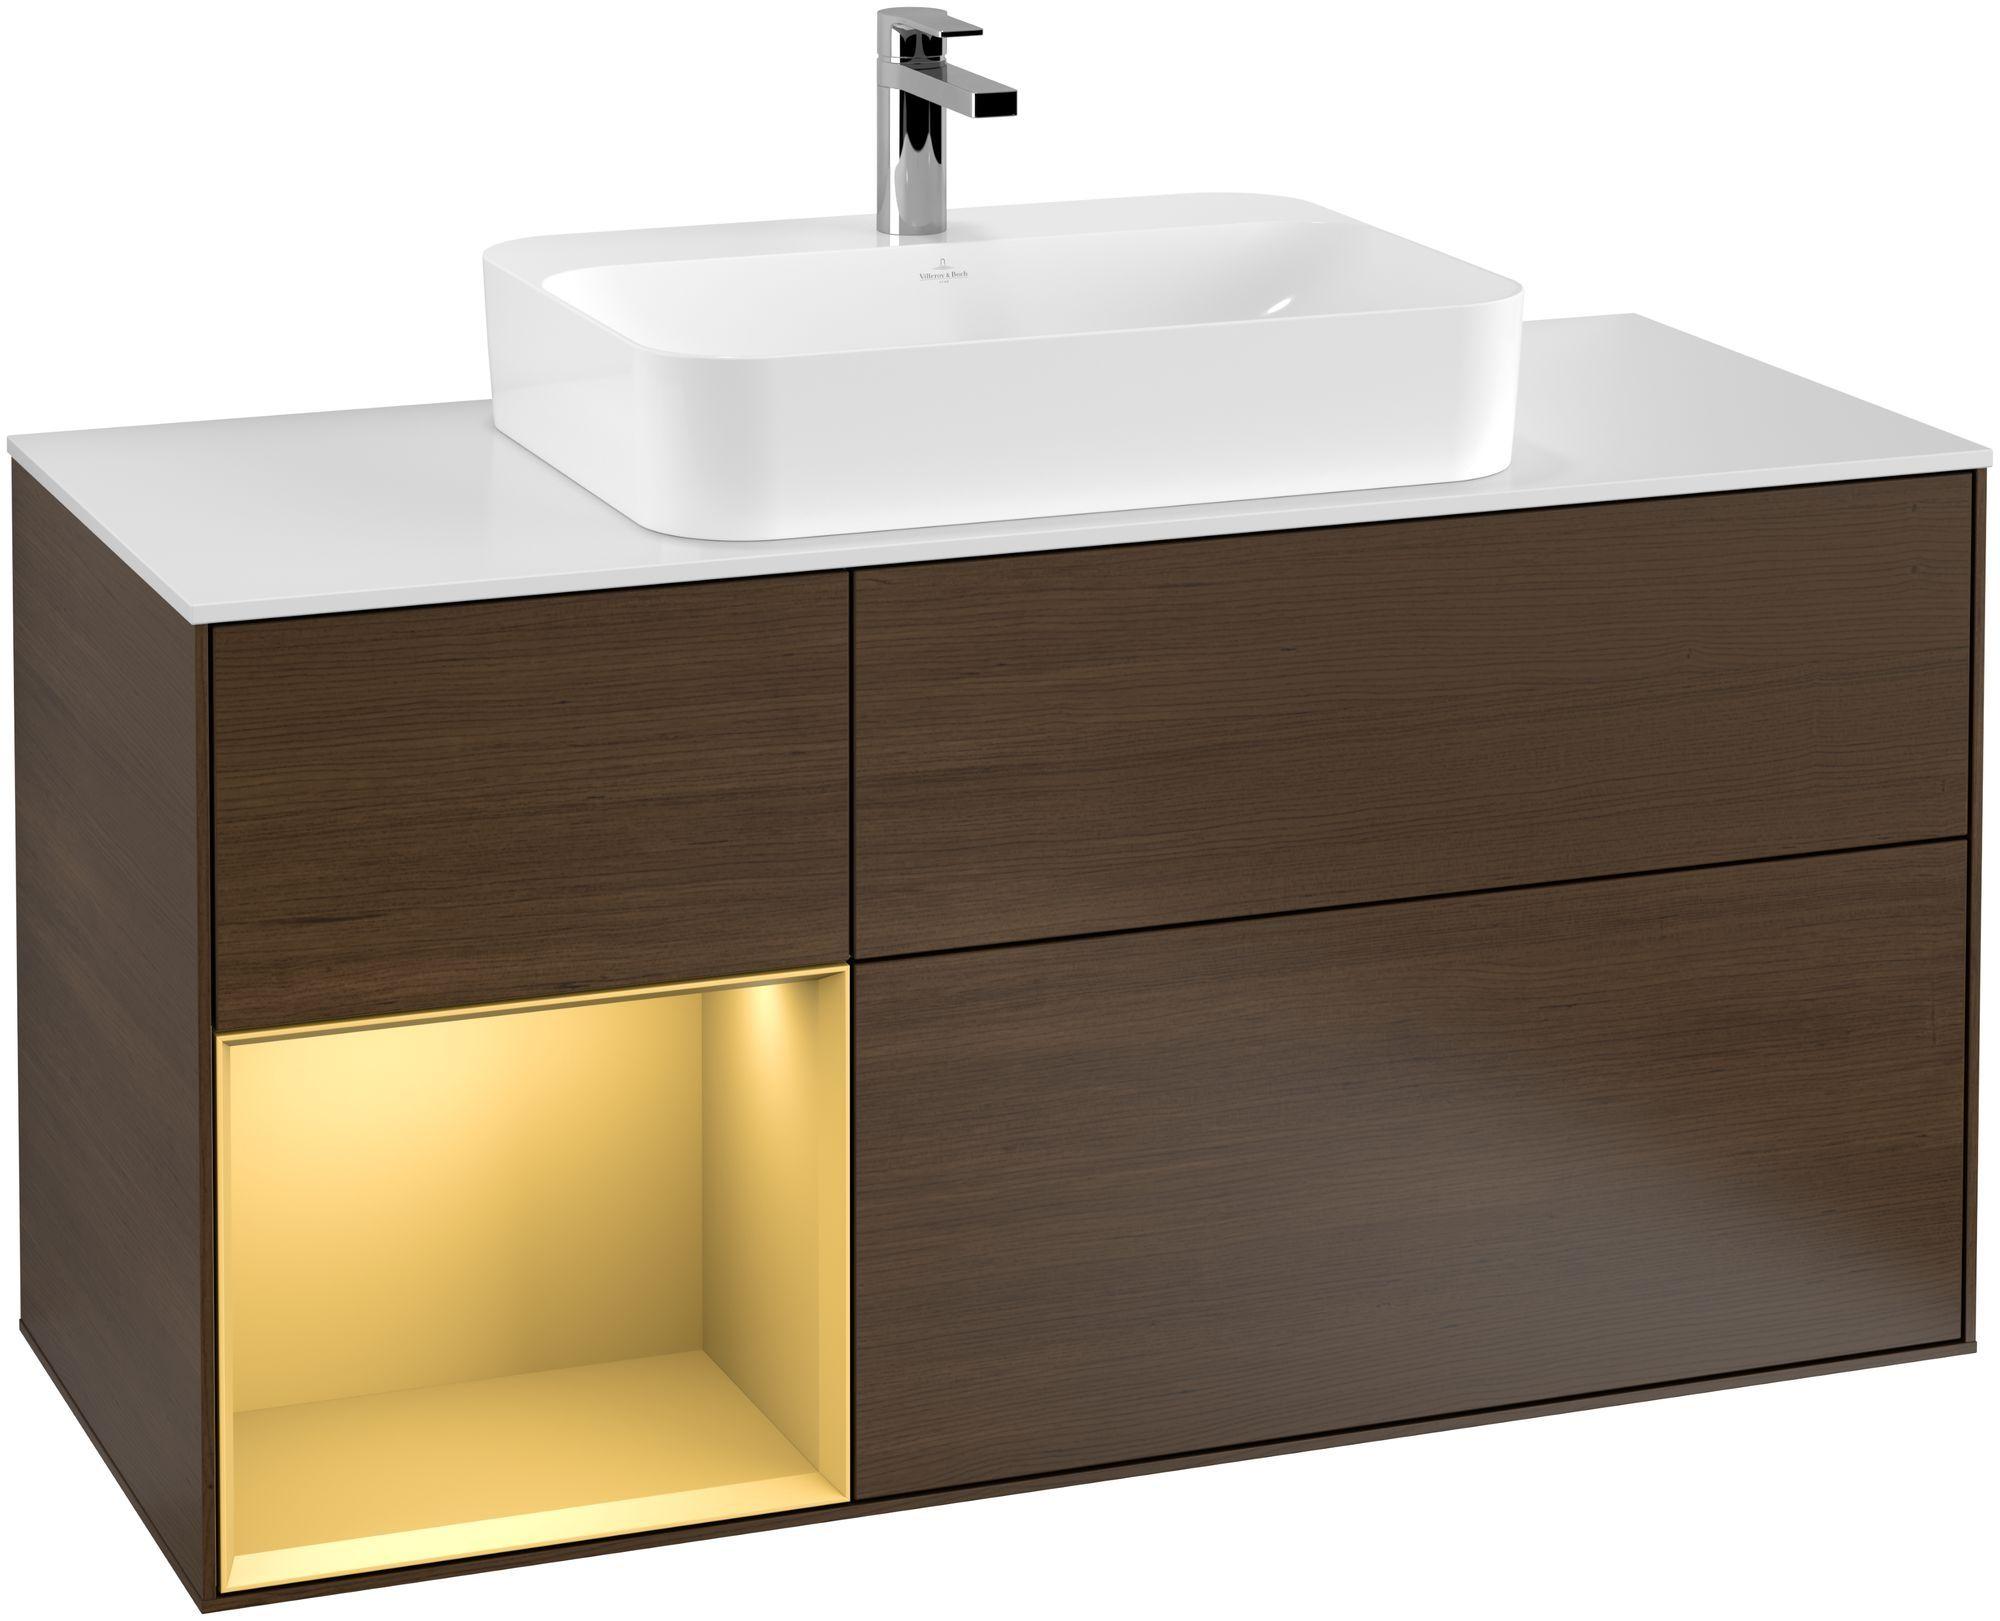 Villeroy & Boch Finion G41 Waschtischunterschrank mit Regalelement 3 Auszüge Waschtisch mittig LED-Beleuchtung B:120xH:60,3xT:50,1cm Front, Korpus: Walnut Veneer, Regal: Gold Matt, Glasplatte: White Matt G411HFGN